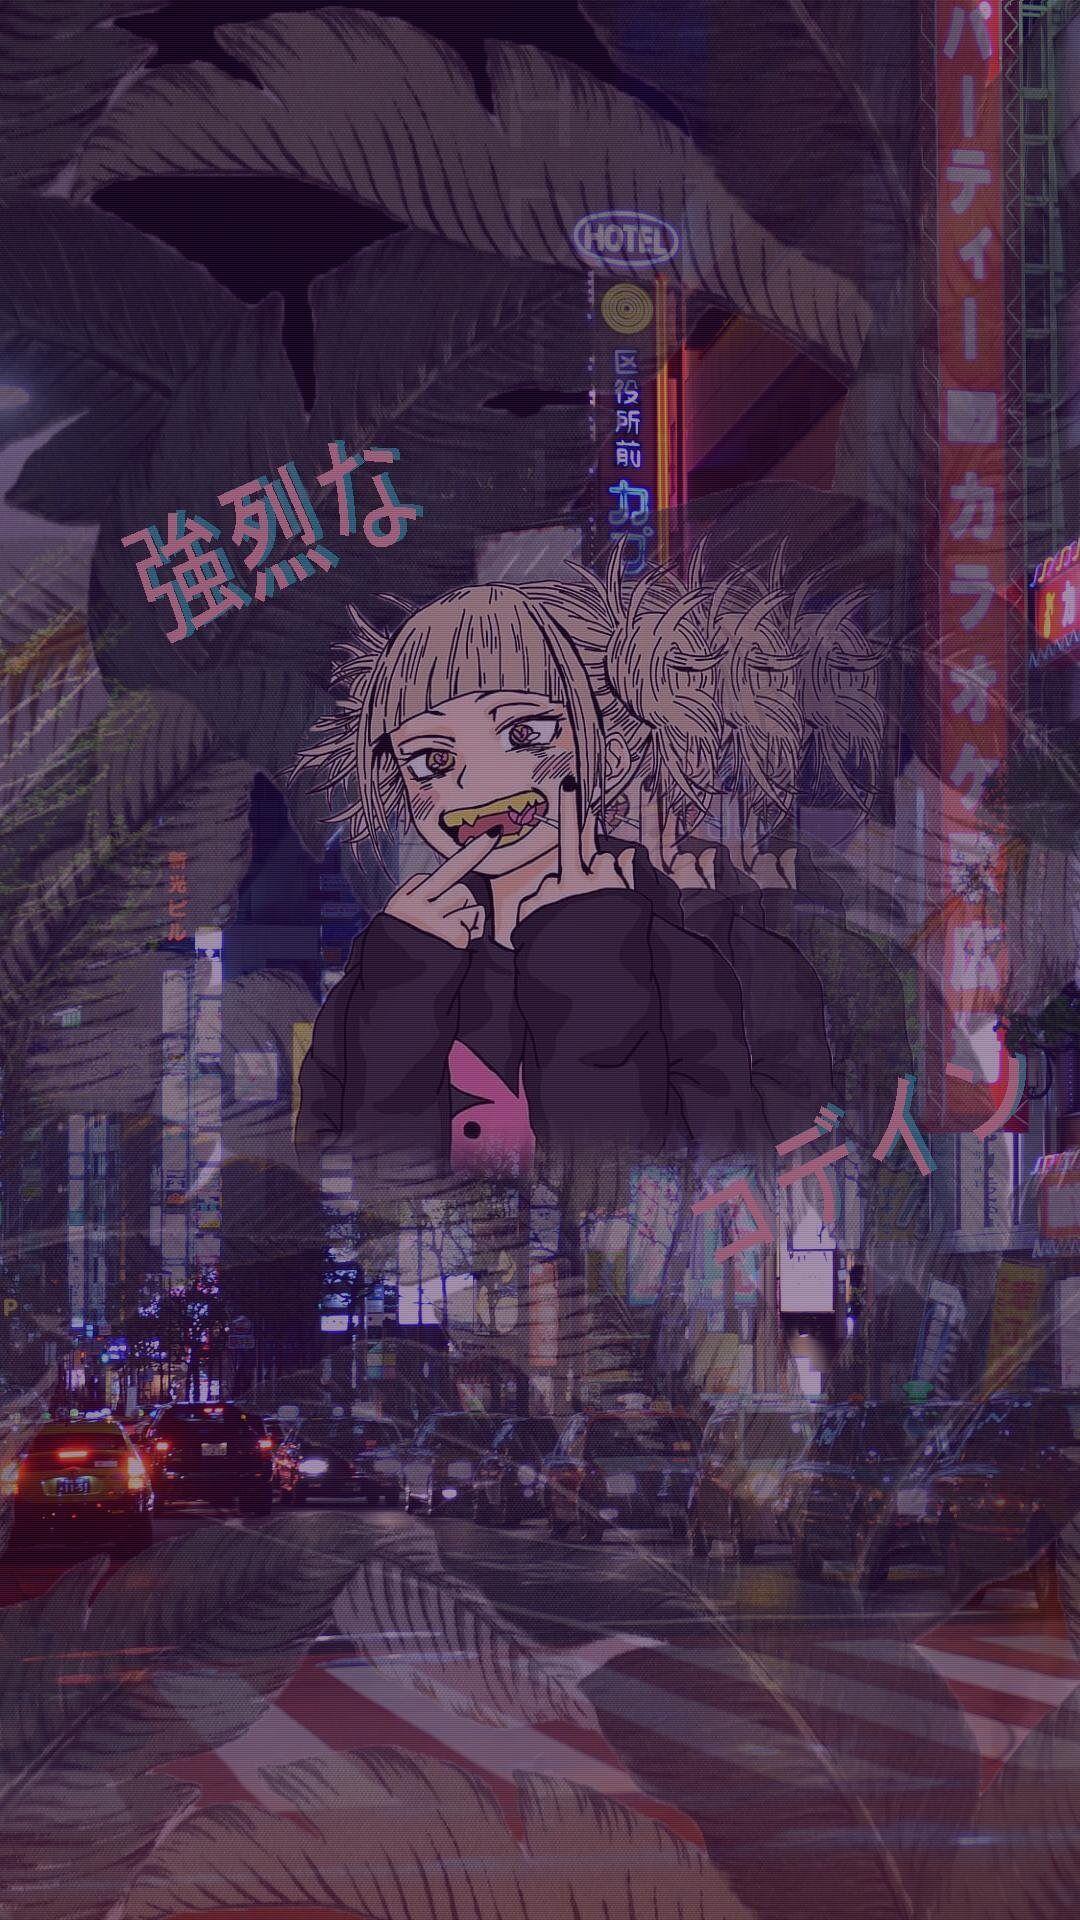 Aesthetic Sasuke Narutowallpaper With Images Wallpaper Naruto